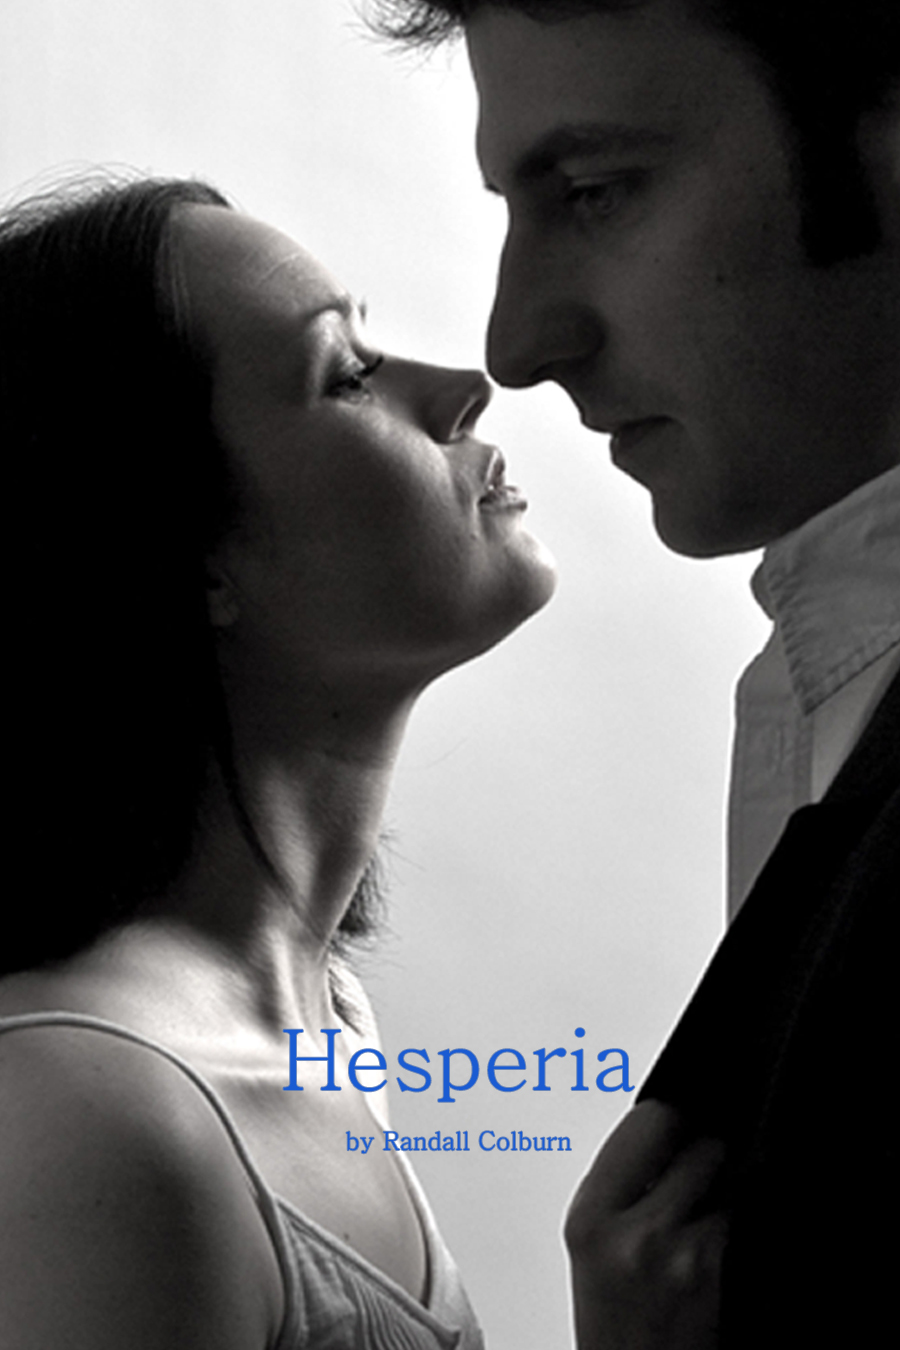 HesperiaPostcardFrontFINAL02 copy.jpg